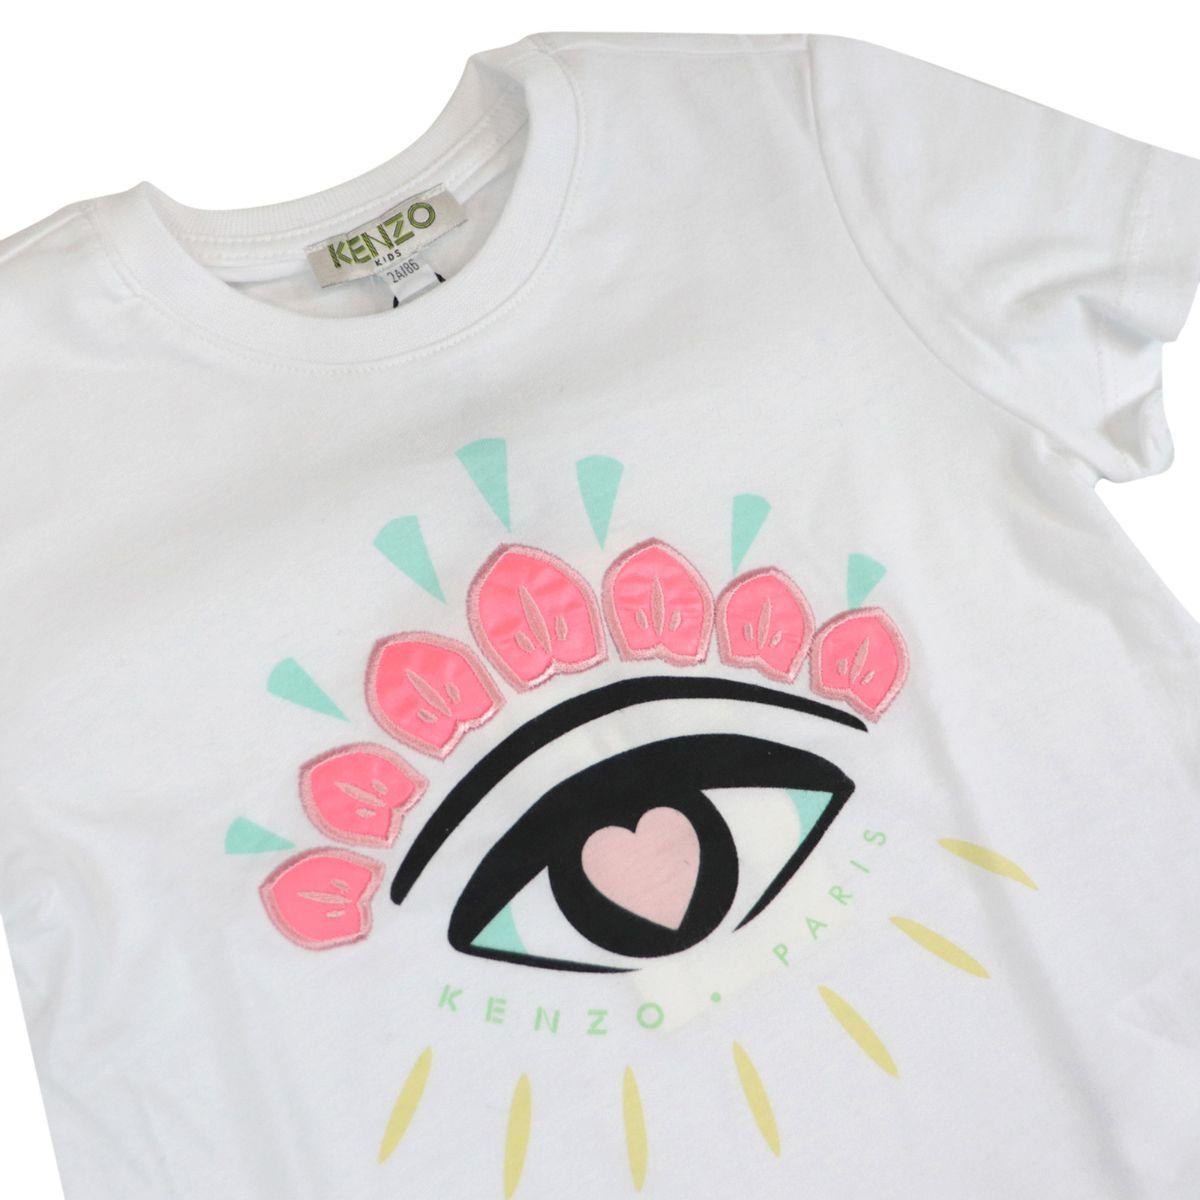 Cotton T-shirt with contrasting Eye logo print White Kenzo